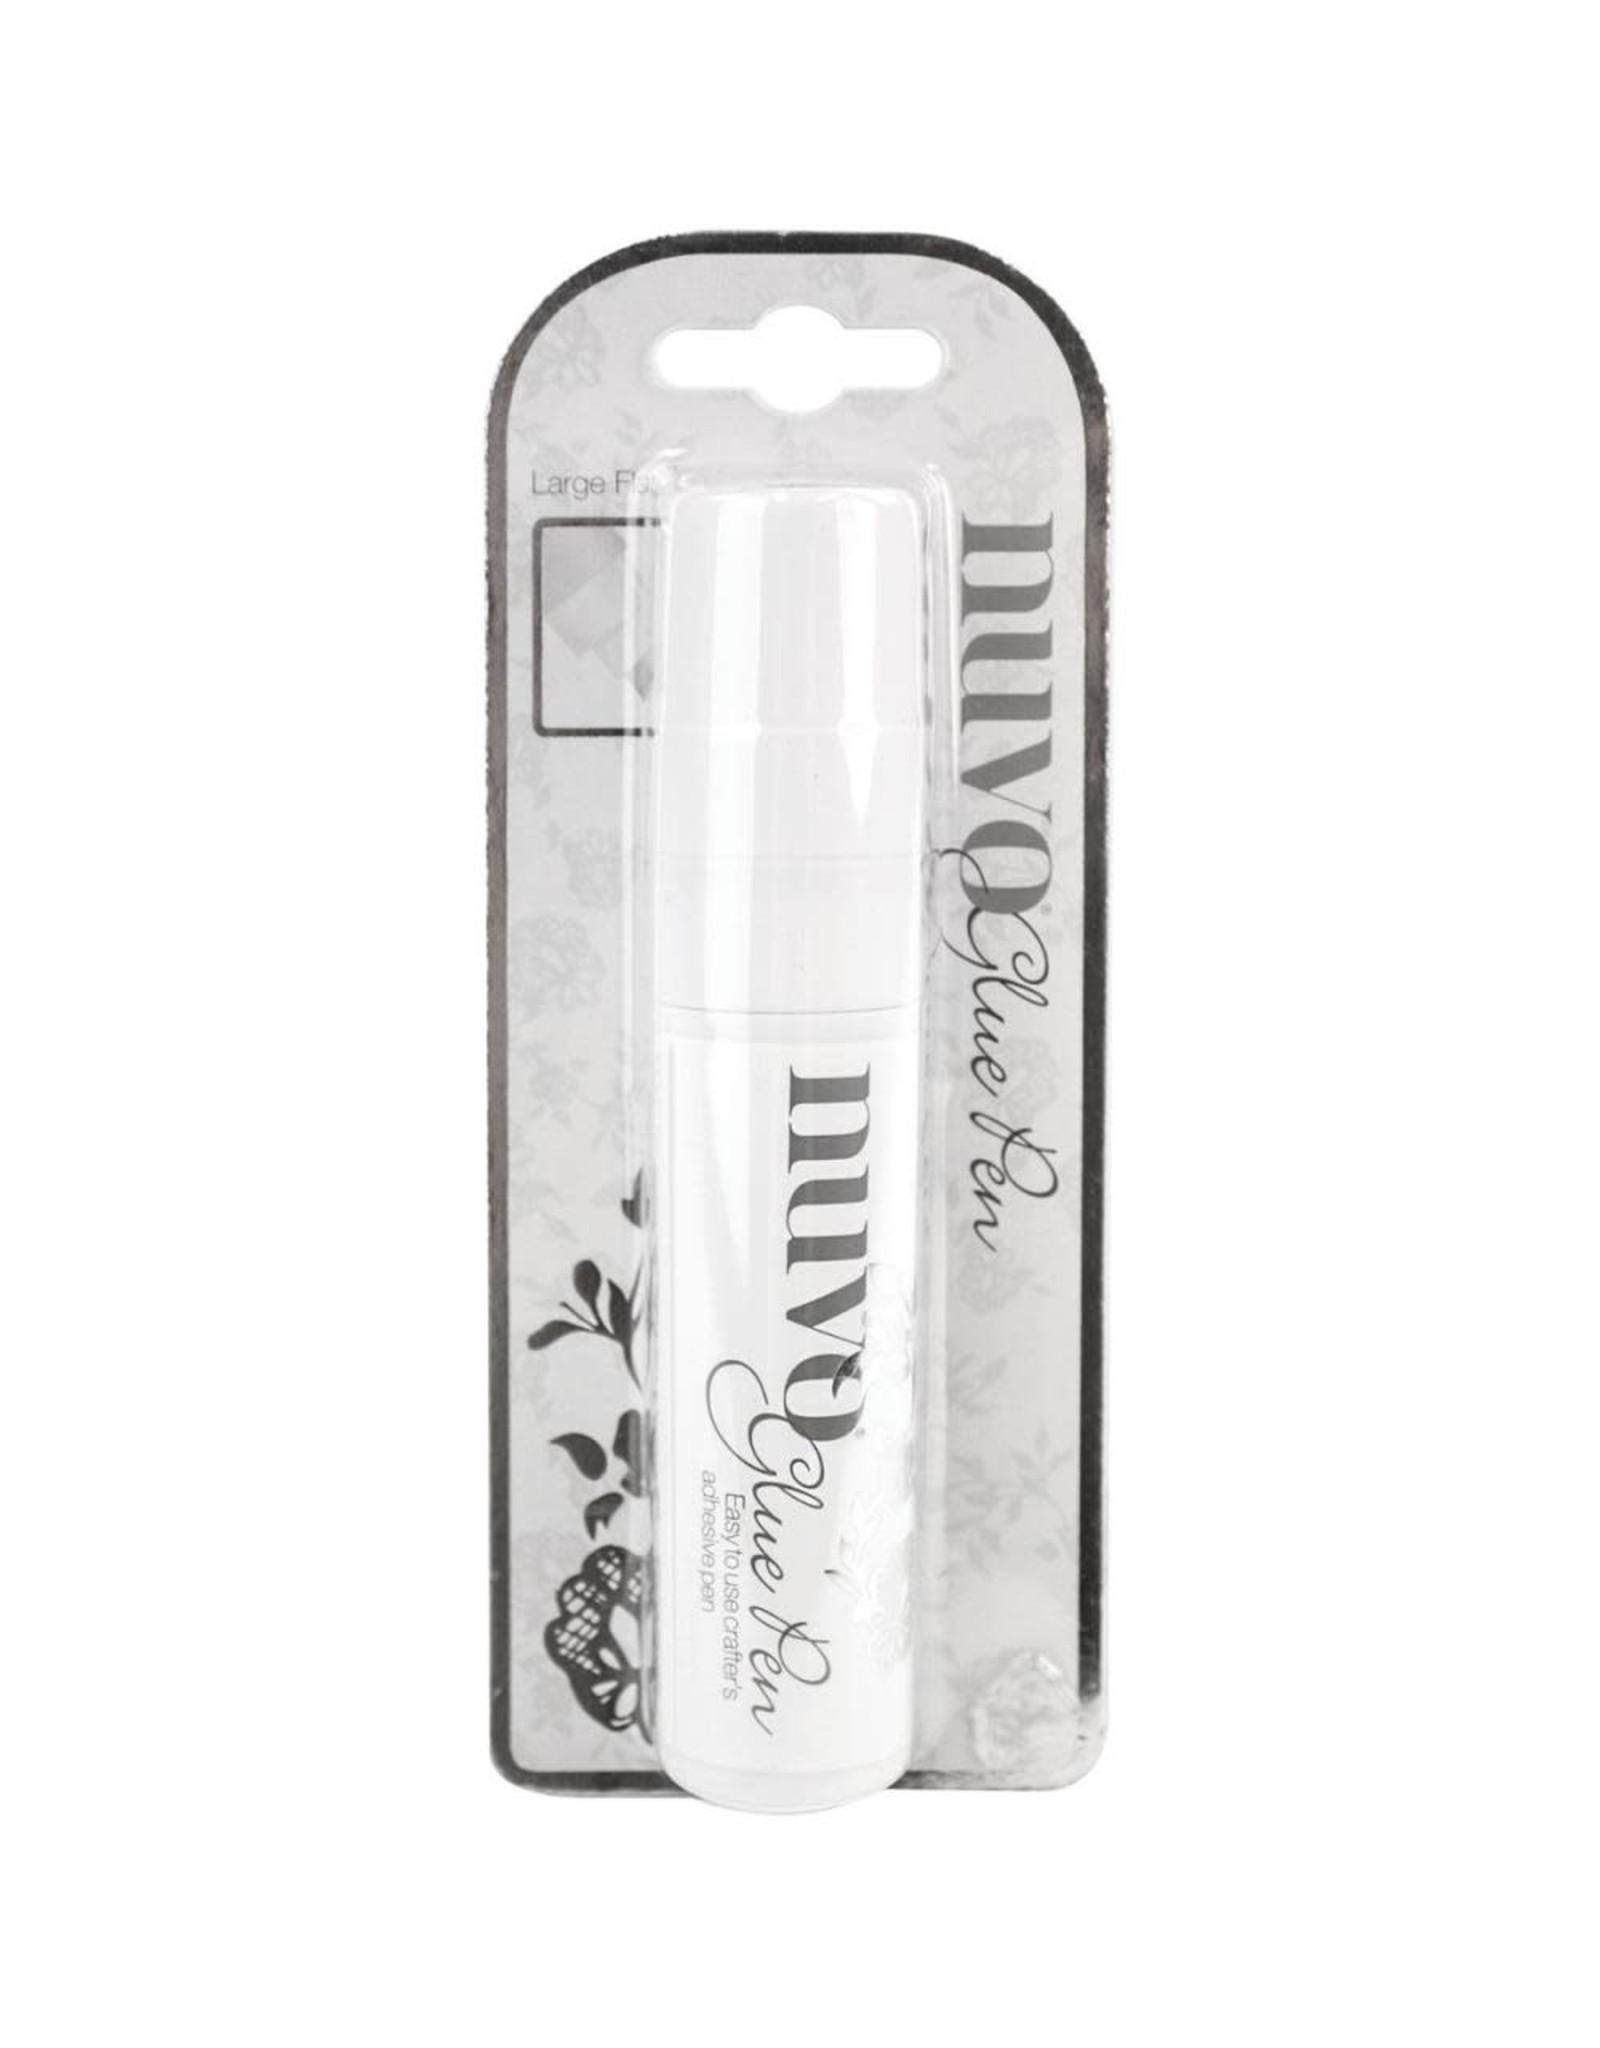 Nuvo Nuvo Glue Pen - Large